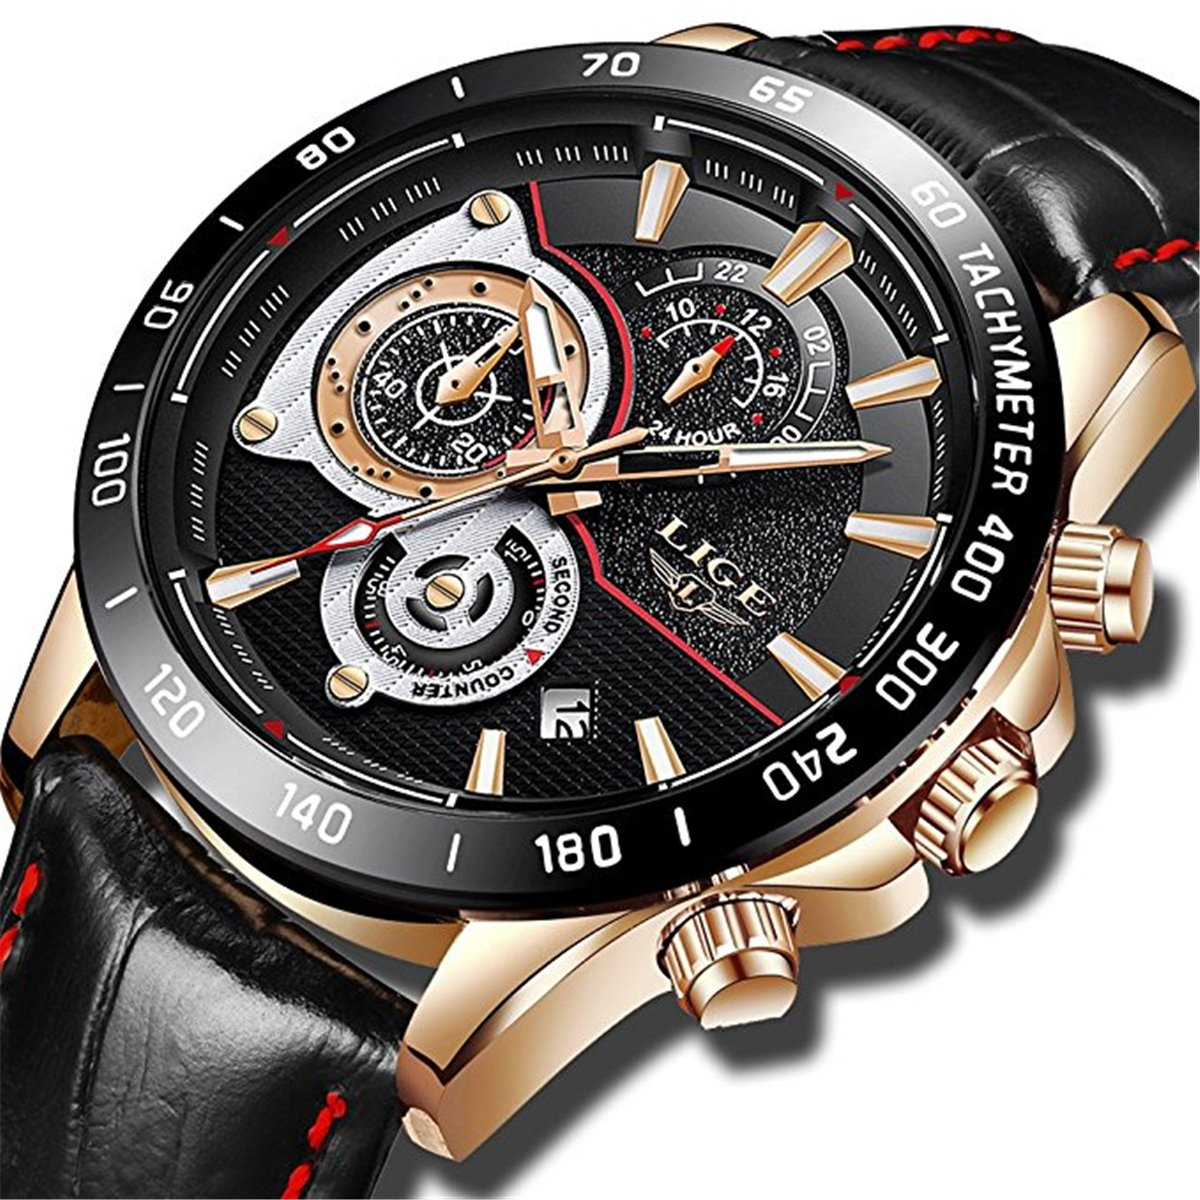 Herren-Uhren-wasserdicht-Chrongraph-Sport-Analog-Quarz-Armbanduhr-Herren-Luxus-Marke-Lige-Fashion-Business-Armbanduhr-Mann-Schwarz-Leder-Uhr